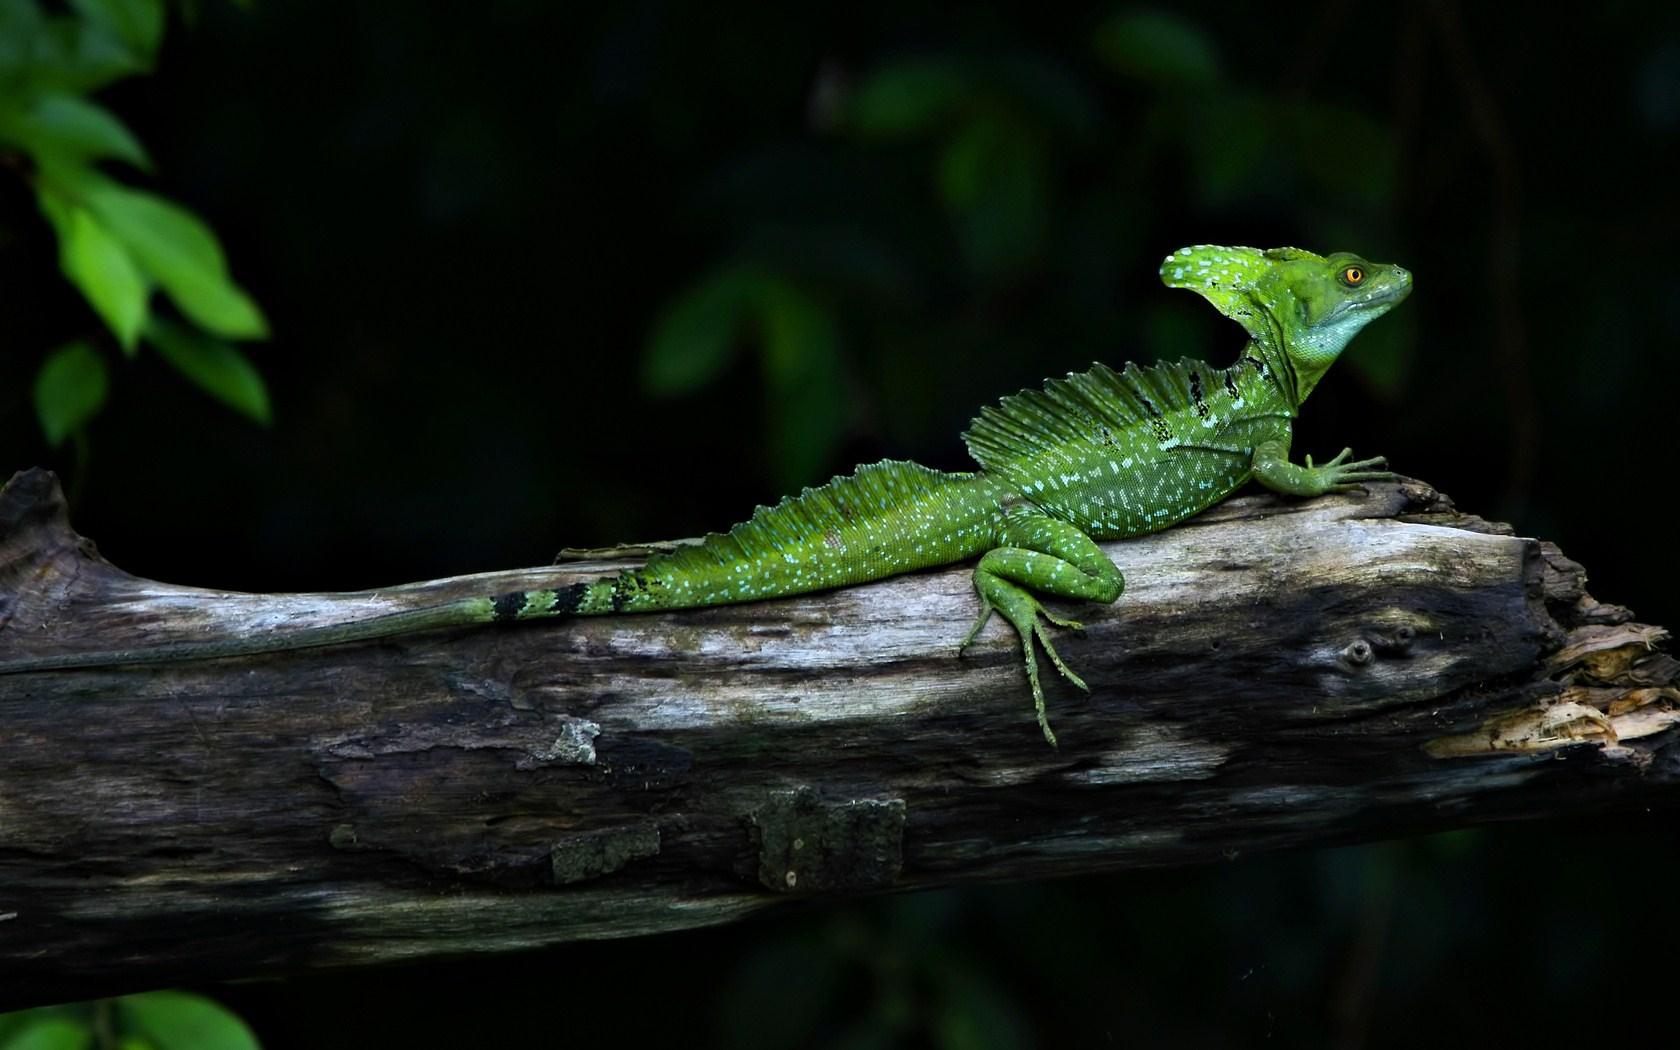 Costa Rica Green Basilisk Lizard Tree Photo HD Wallpaper